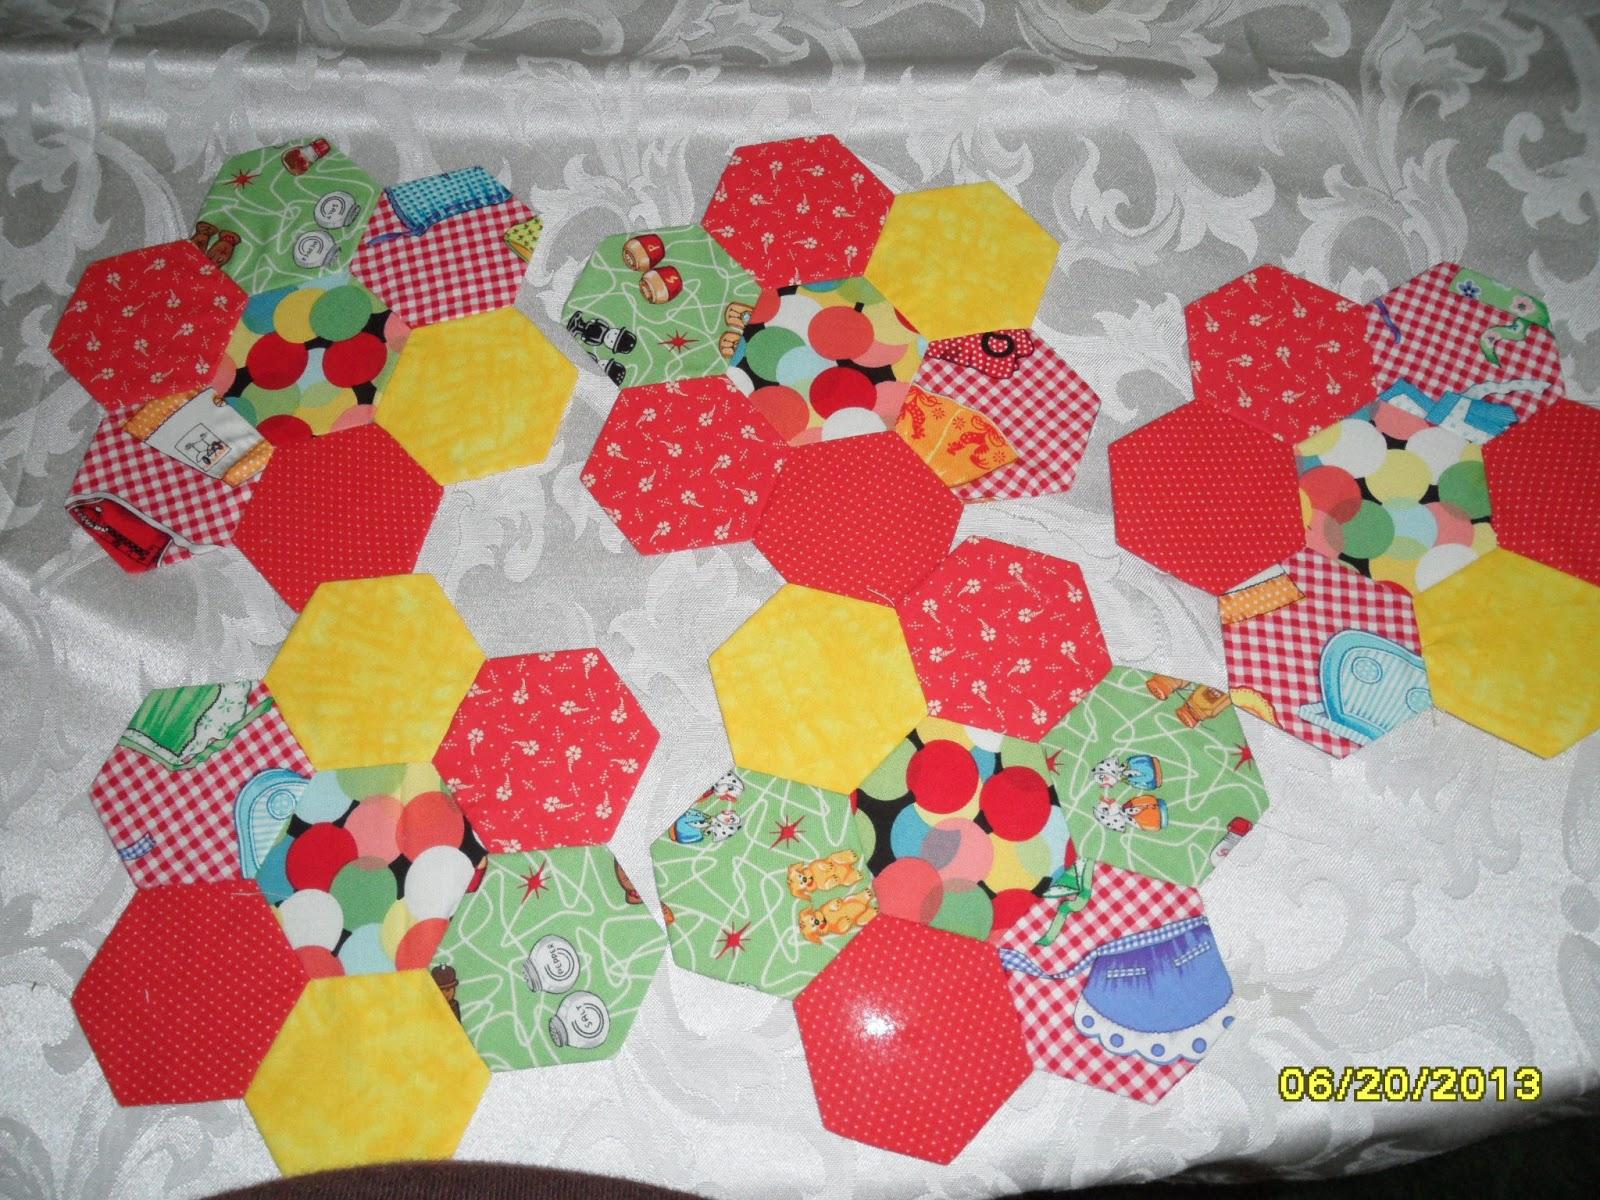 hexagon quilt template plastic - in sewtopia the hexagon english paper piecing plastic